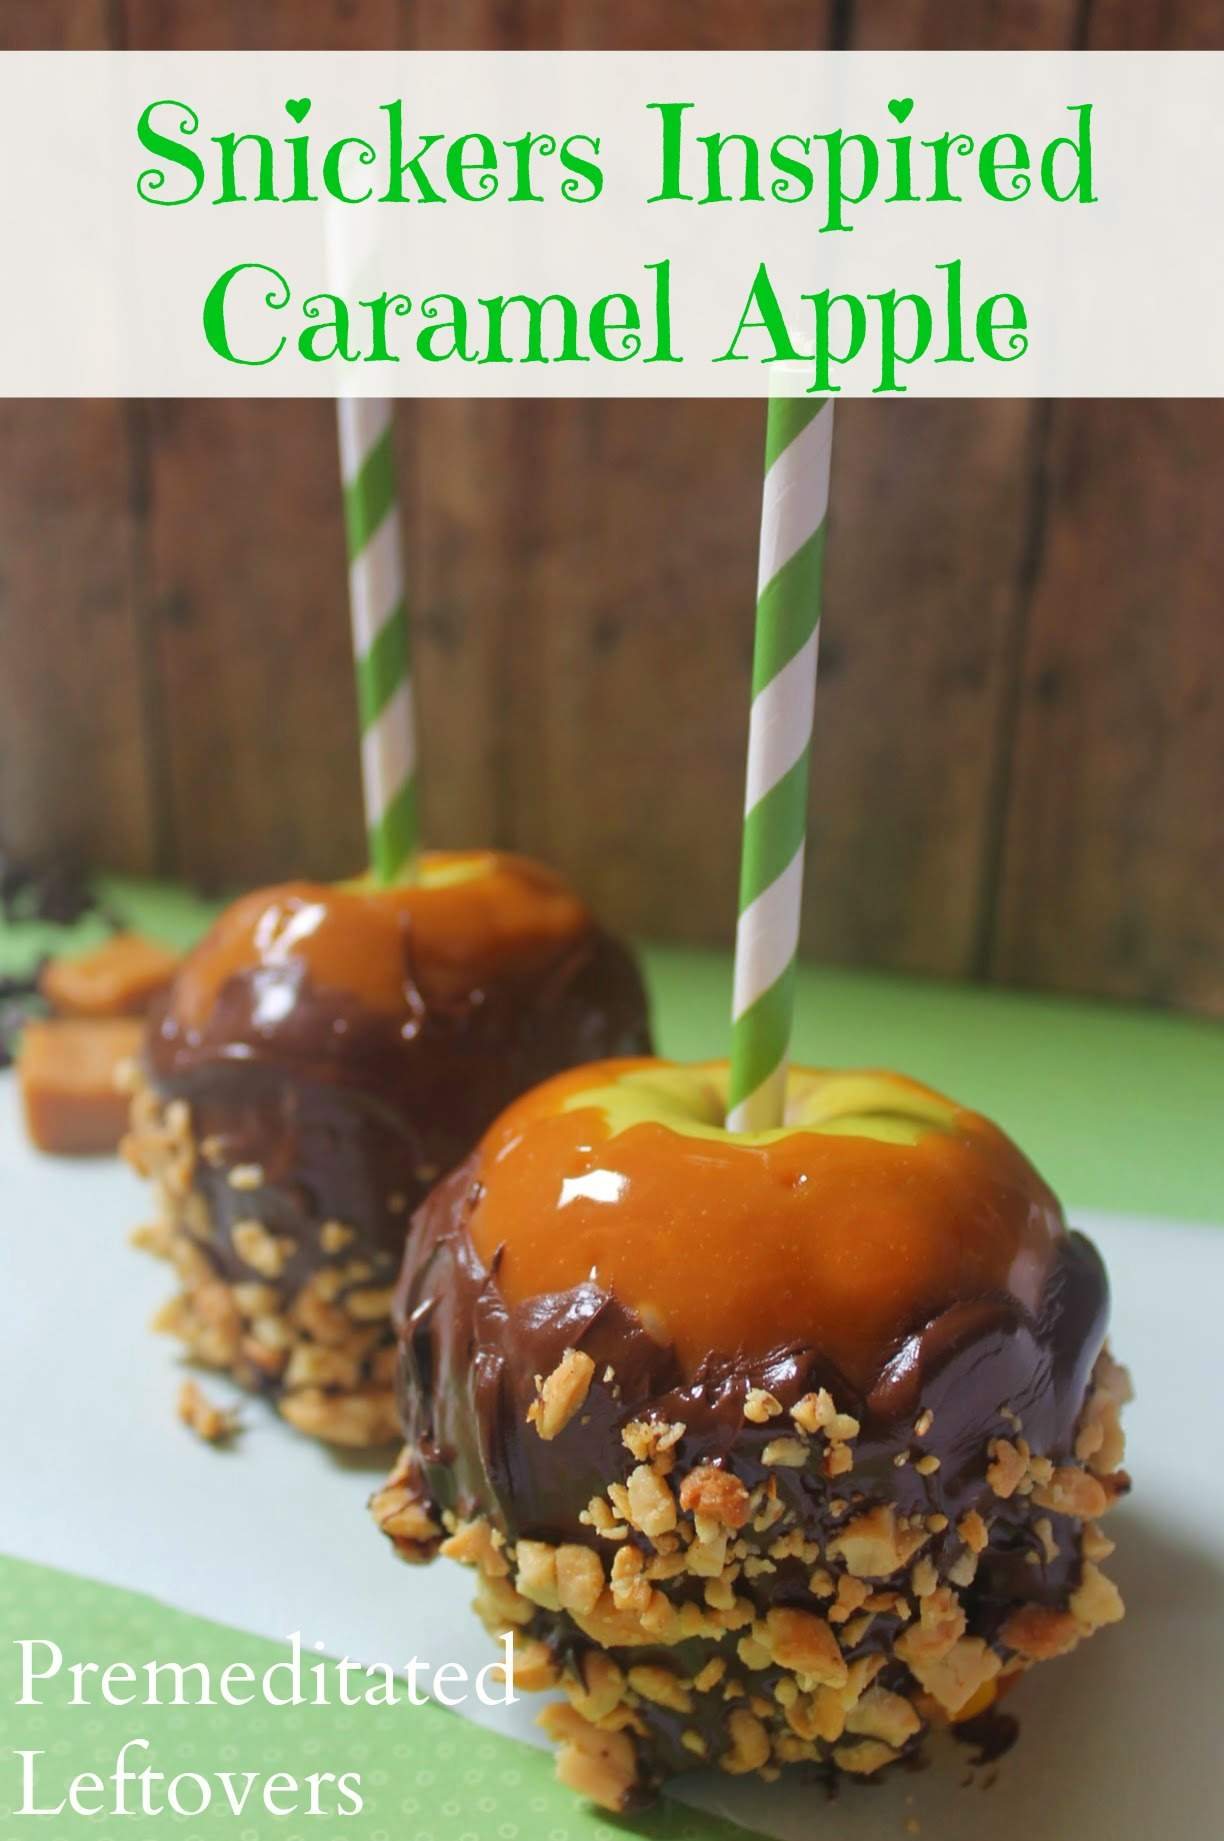 Snickers Inspired Caramel Apples Recipe A Gourmet Caramel Apple Idea